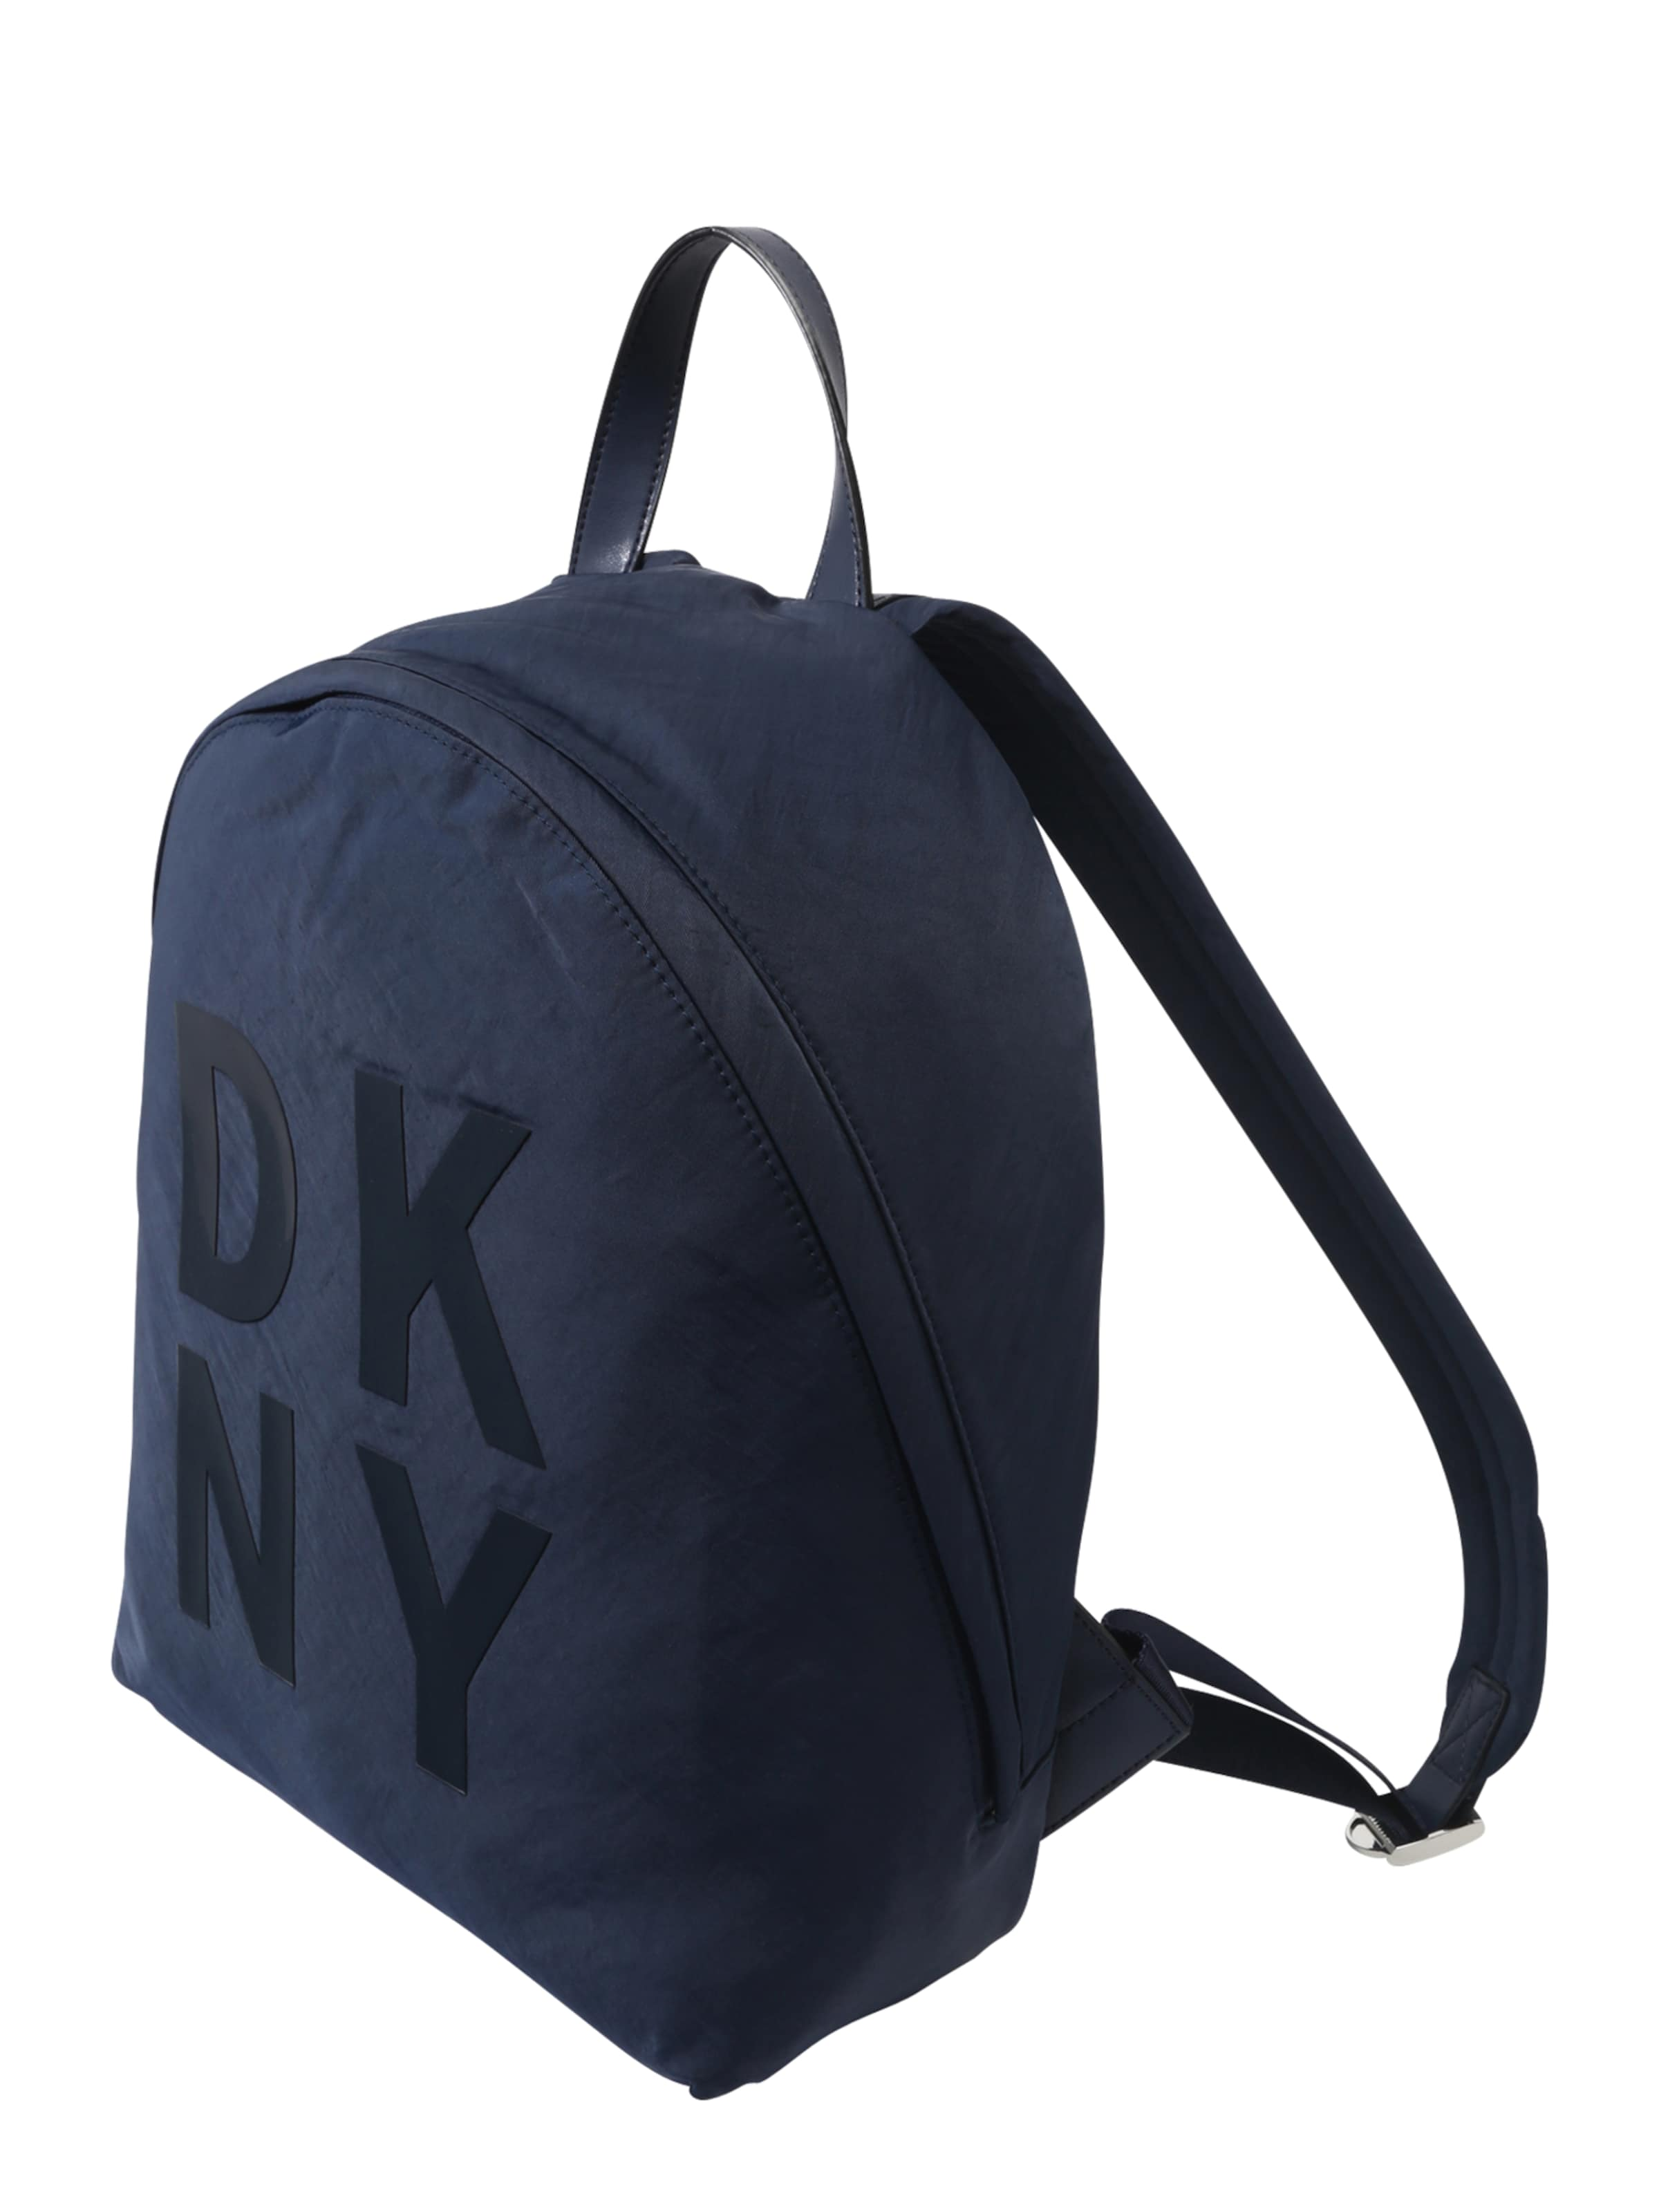 Dos lg A 'ave Backpack Sac En À Dkny nylon' NoirArgent htdrCsQx